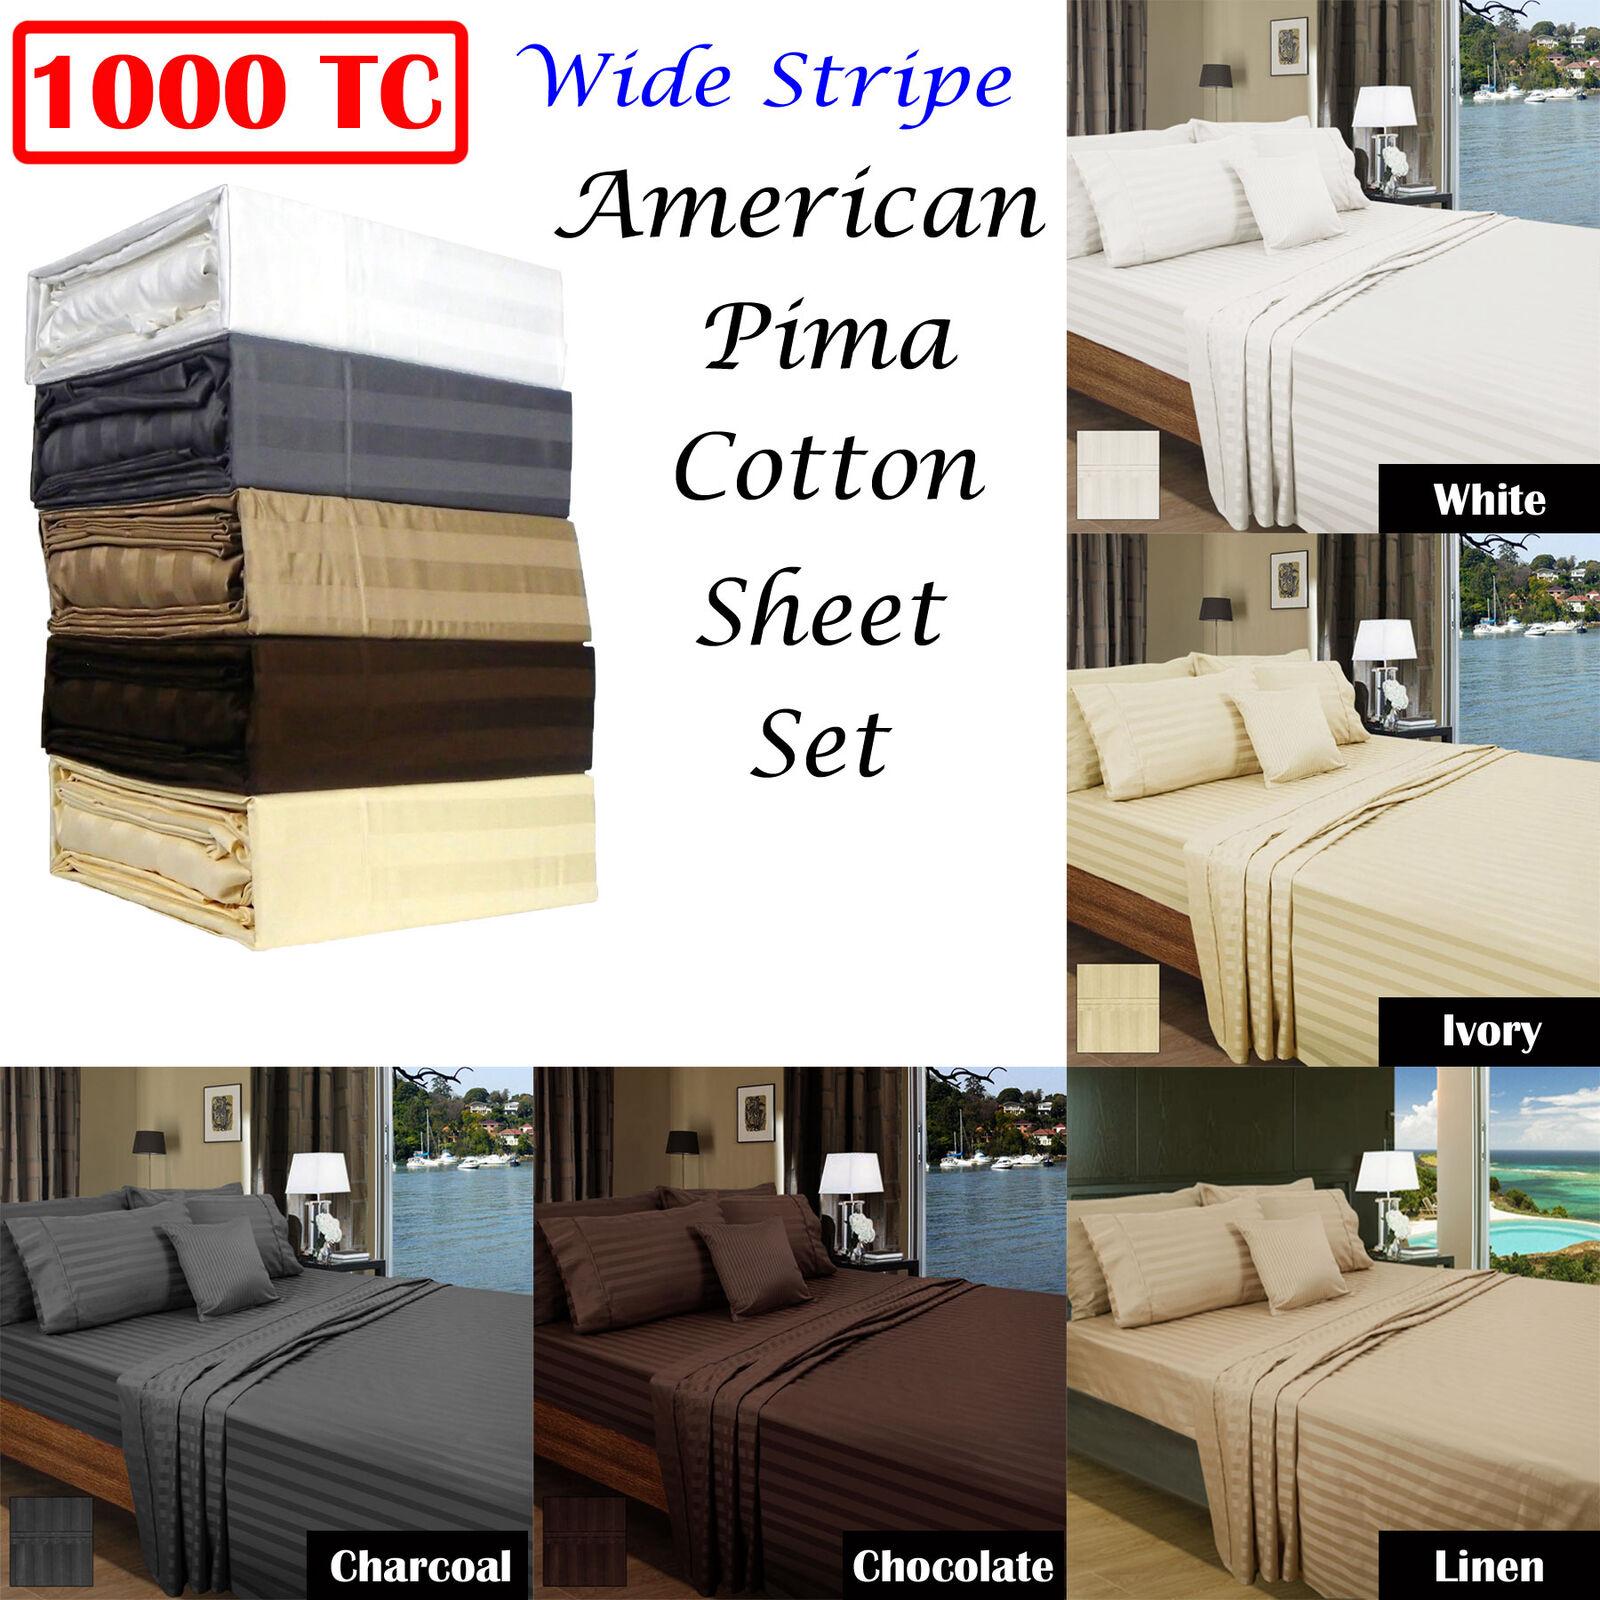 1000TC American Pima Cotton Wide Stripe Sheet Set by Ramesses QUEEN KING